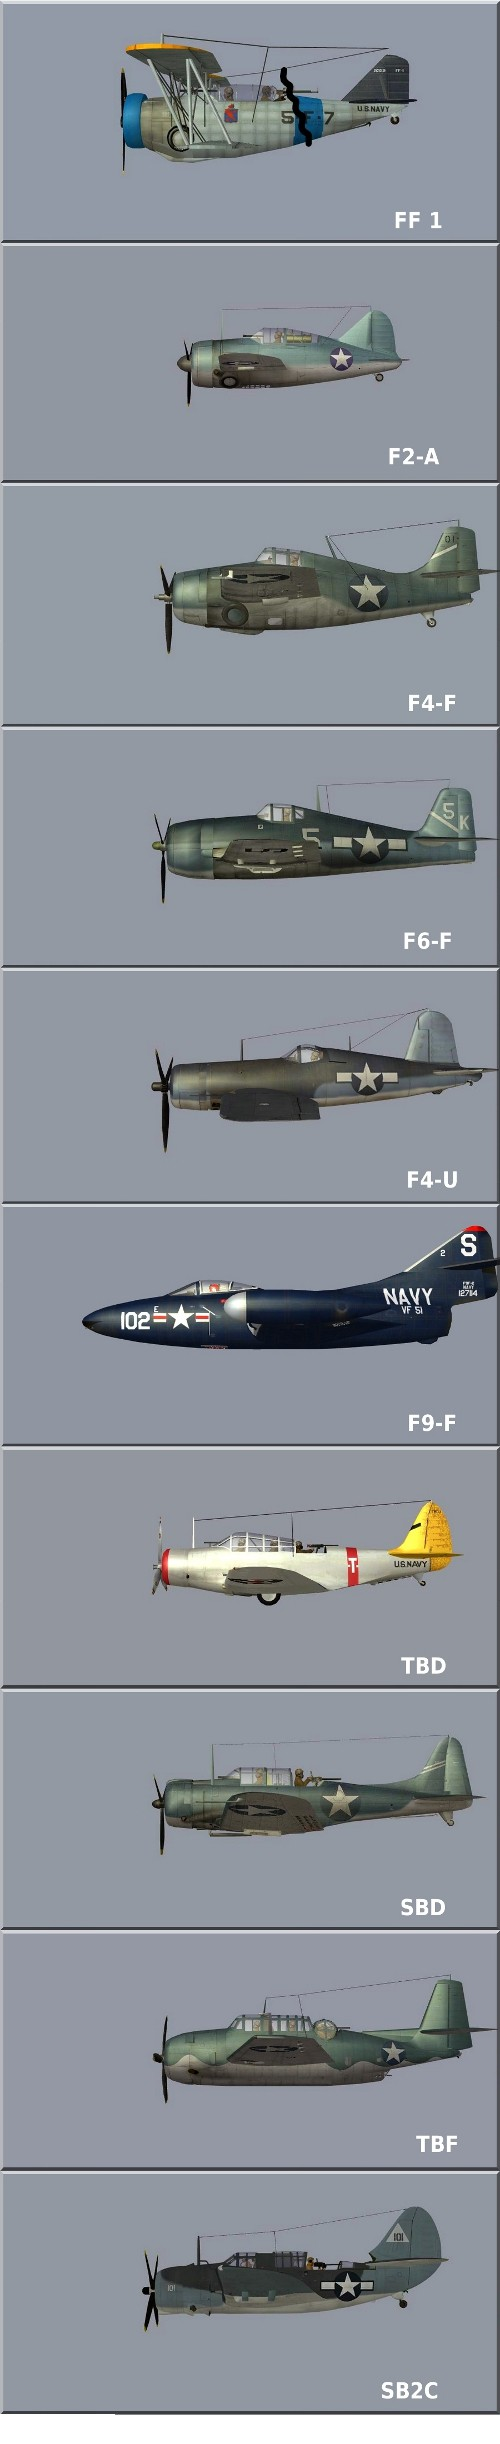 tournage de film : hommage à l'US Navy == lundi 10 mars 2014== HSFX 7.02 Usnavy10